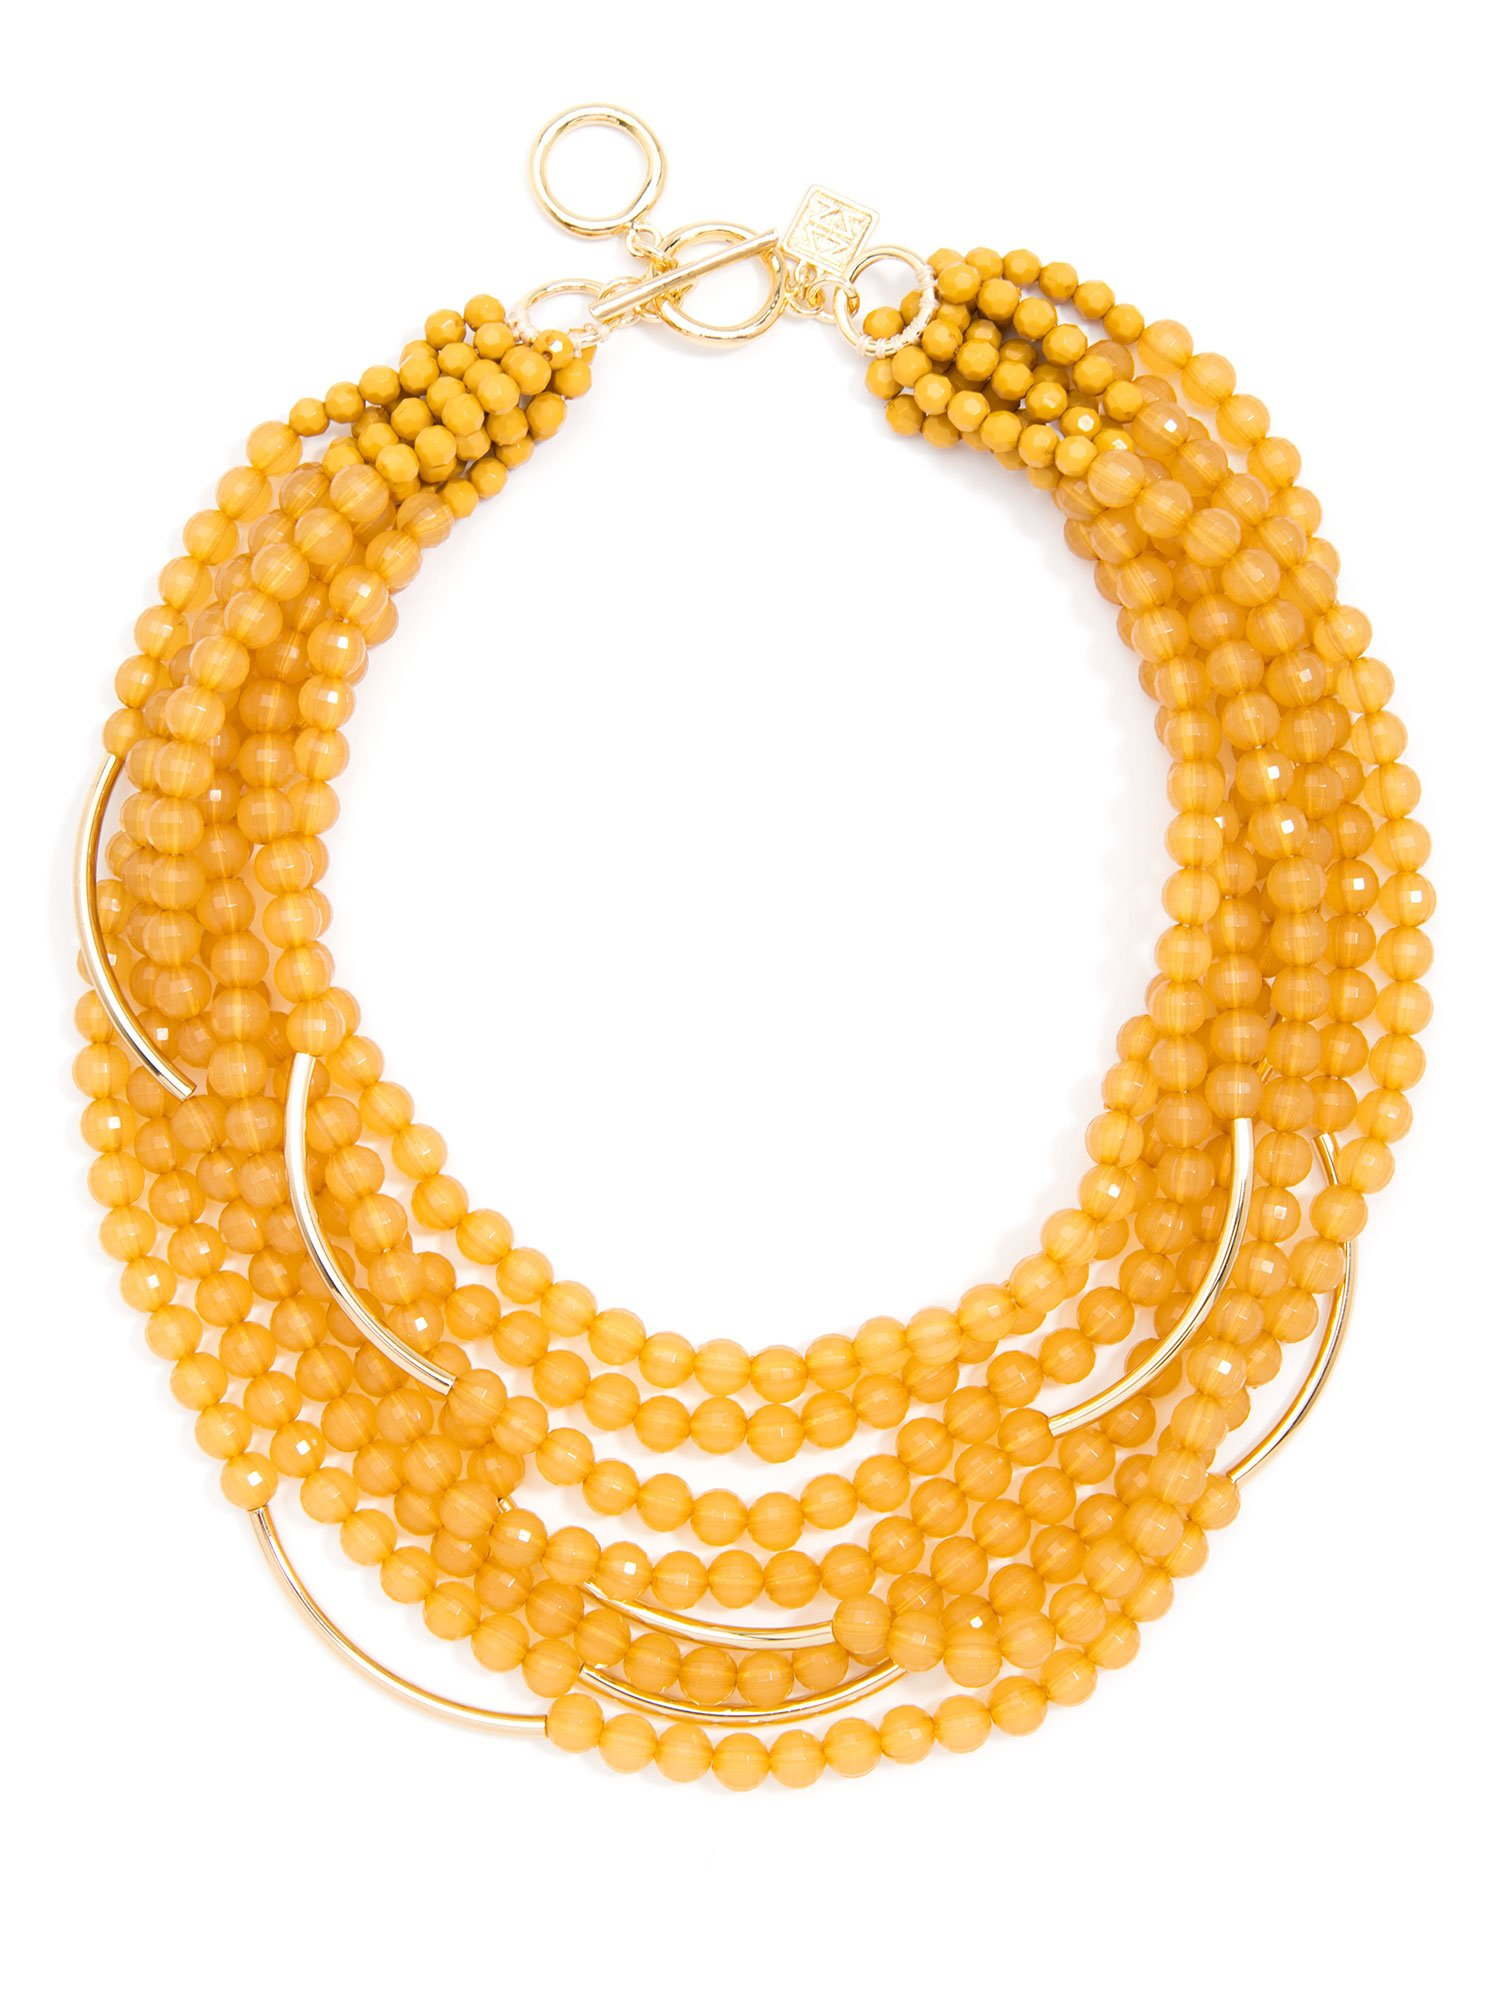 ZENZII Catch The Wave Beaded Necklace (Honey)